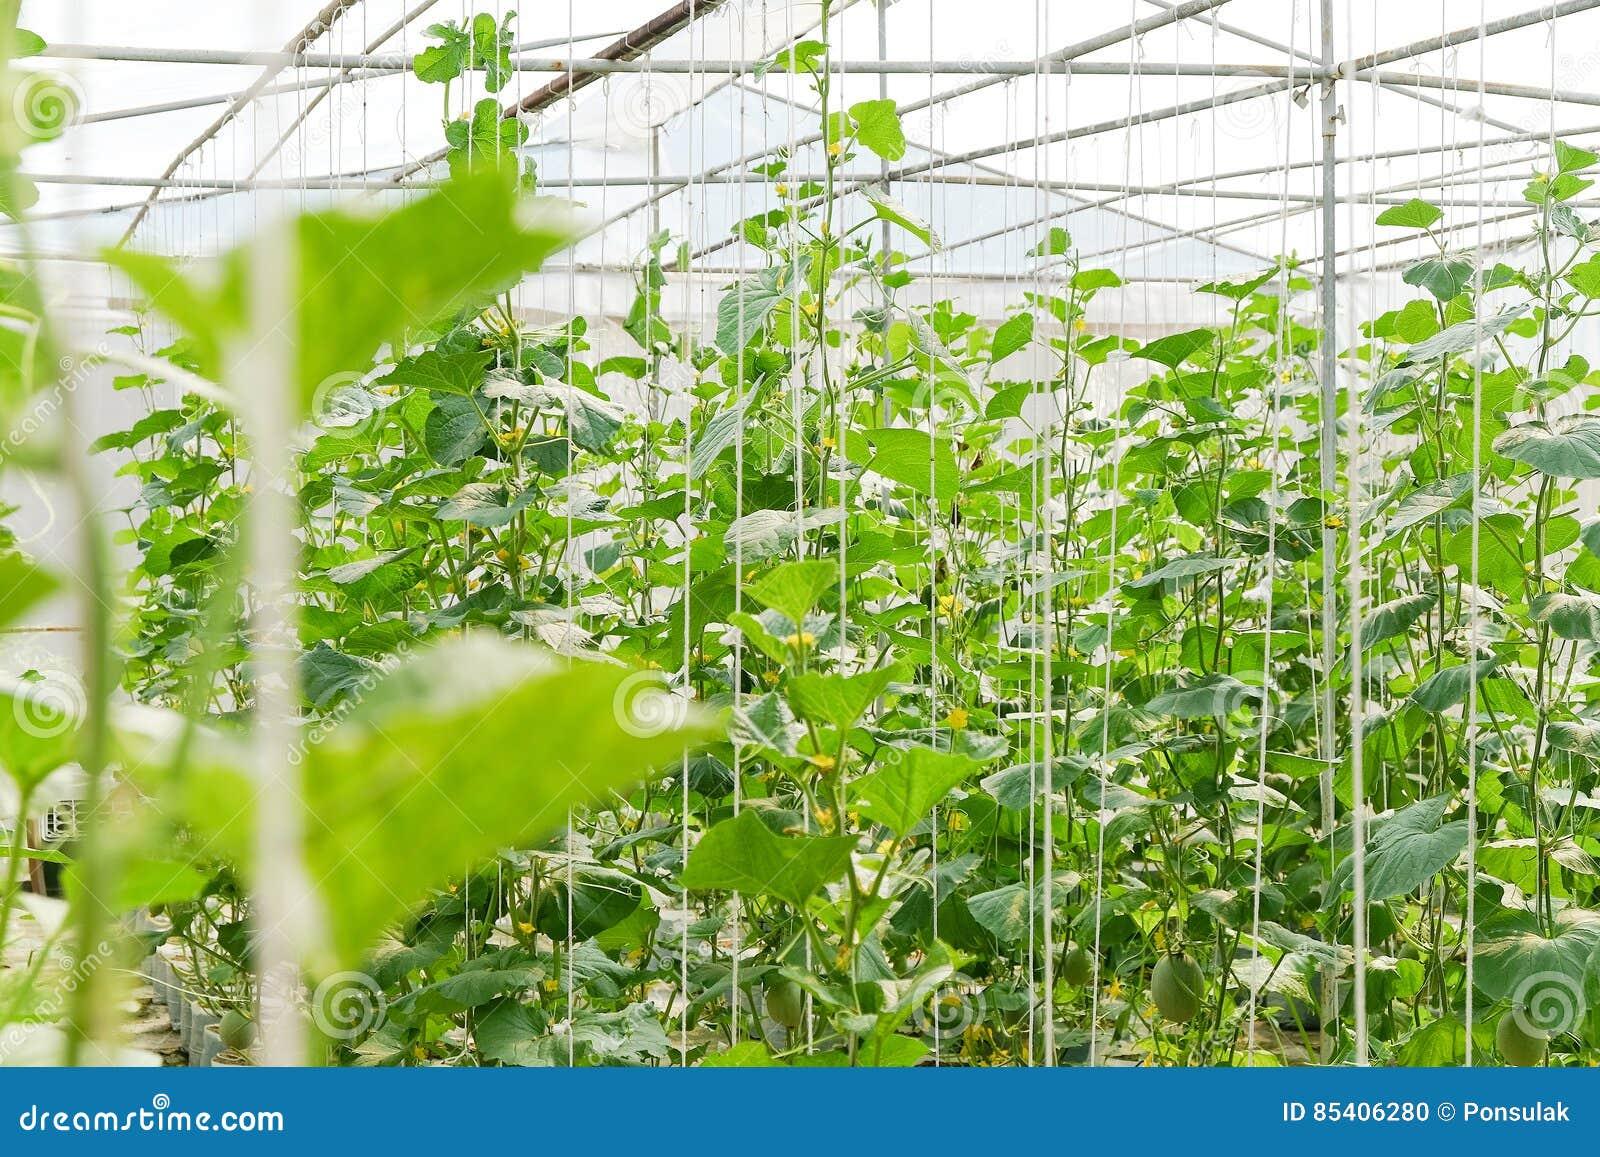 plantation de melon en serre chaude photo stock image 85406280. Black Bedroom Furniture Sets. Home Design Ideas